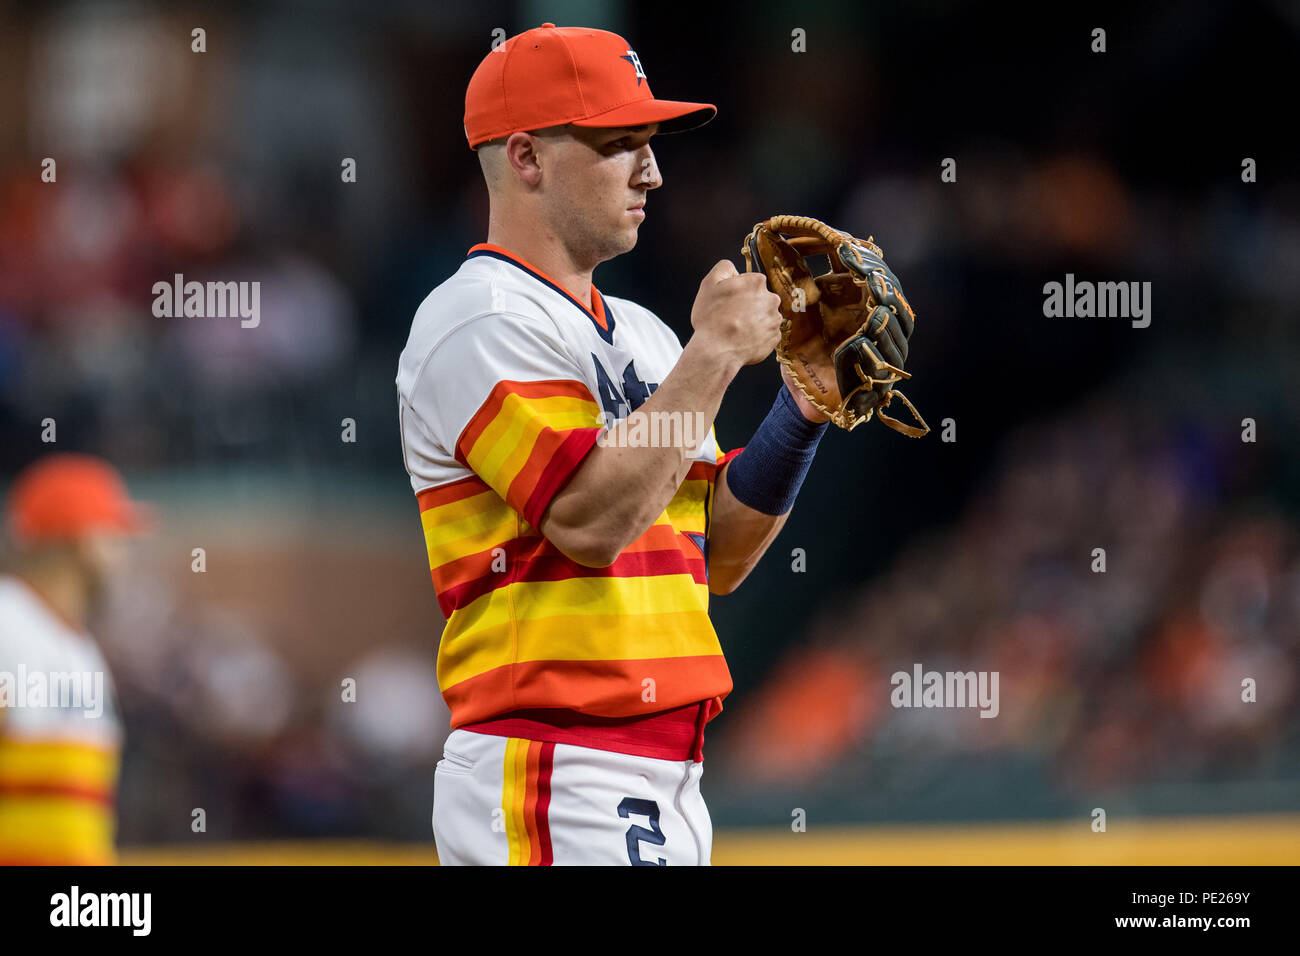 new concept 288a7 54c78 August 10, 2018: Houston Astros third baseman Alex Bregman ...